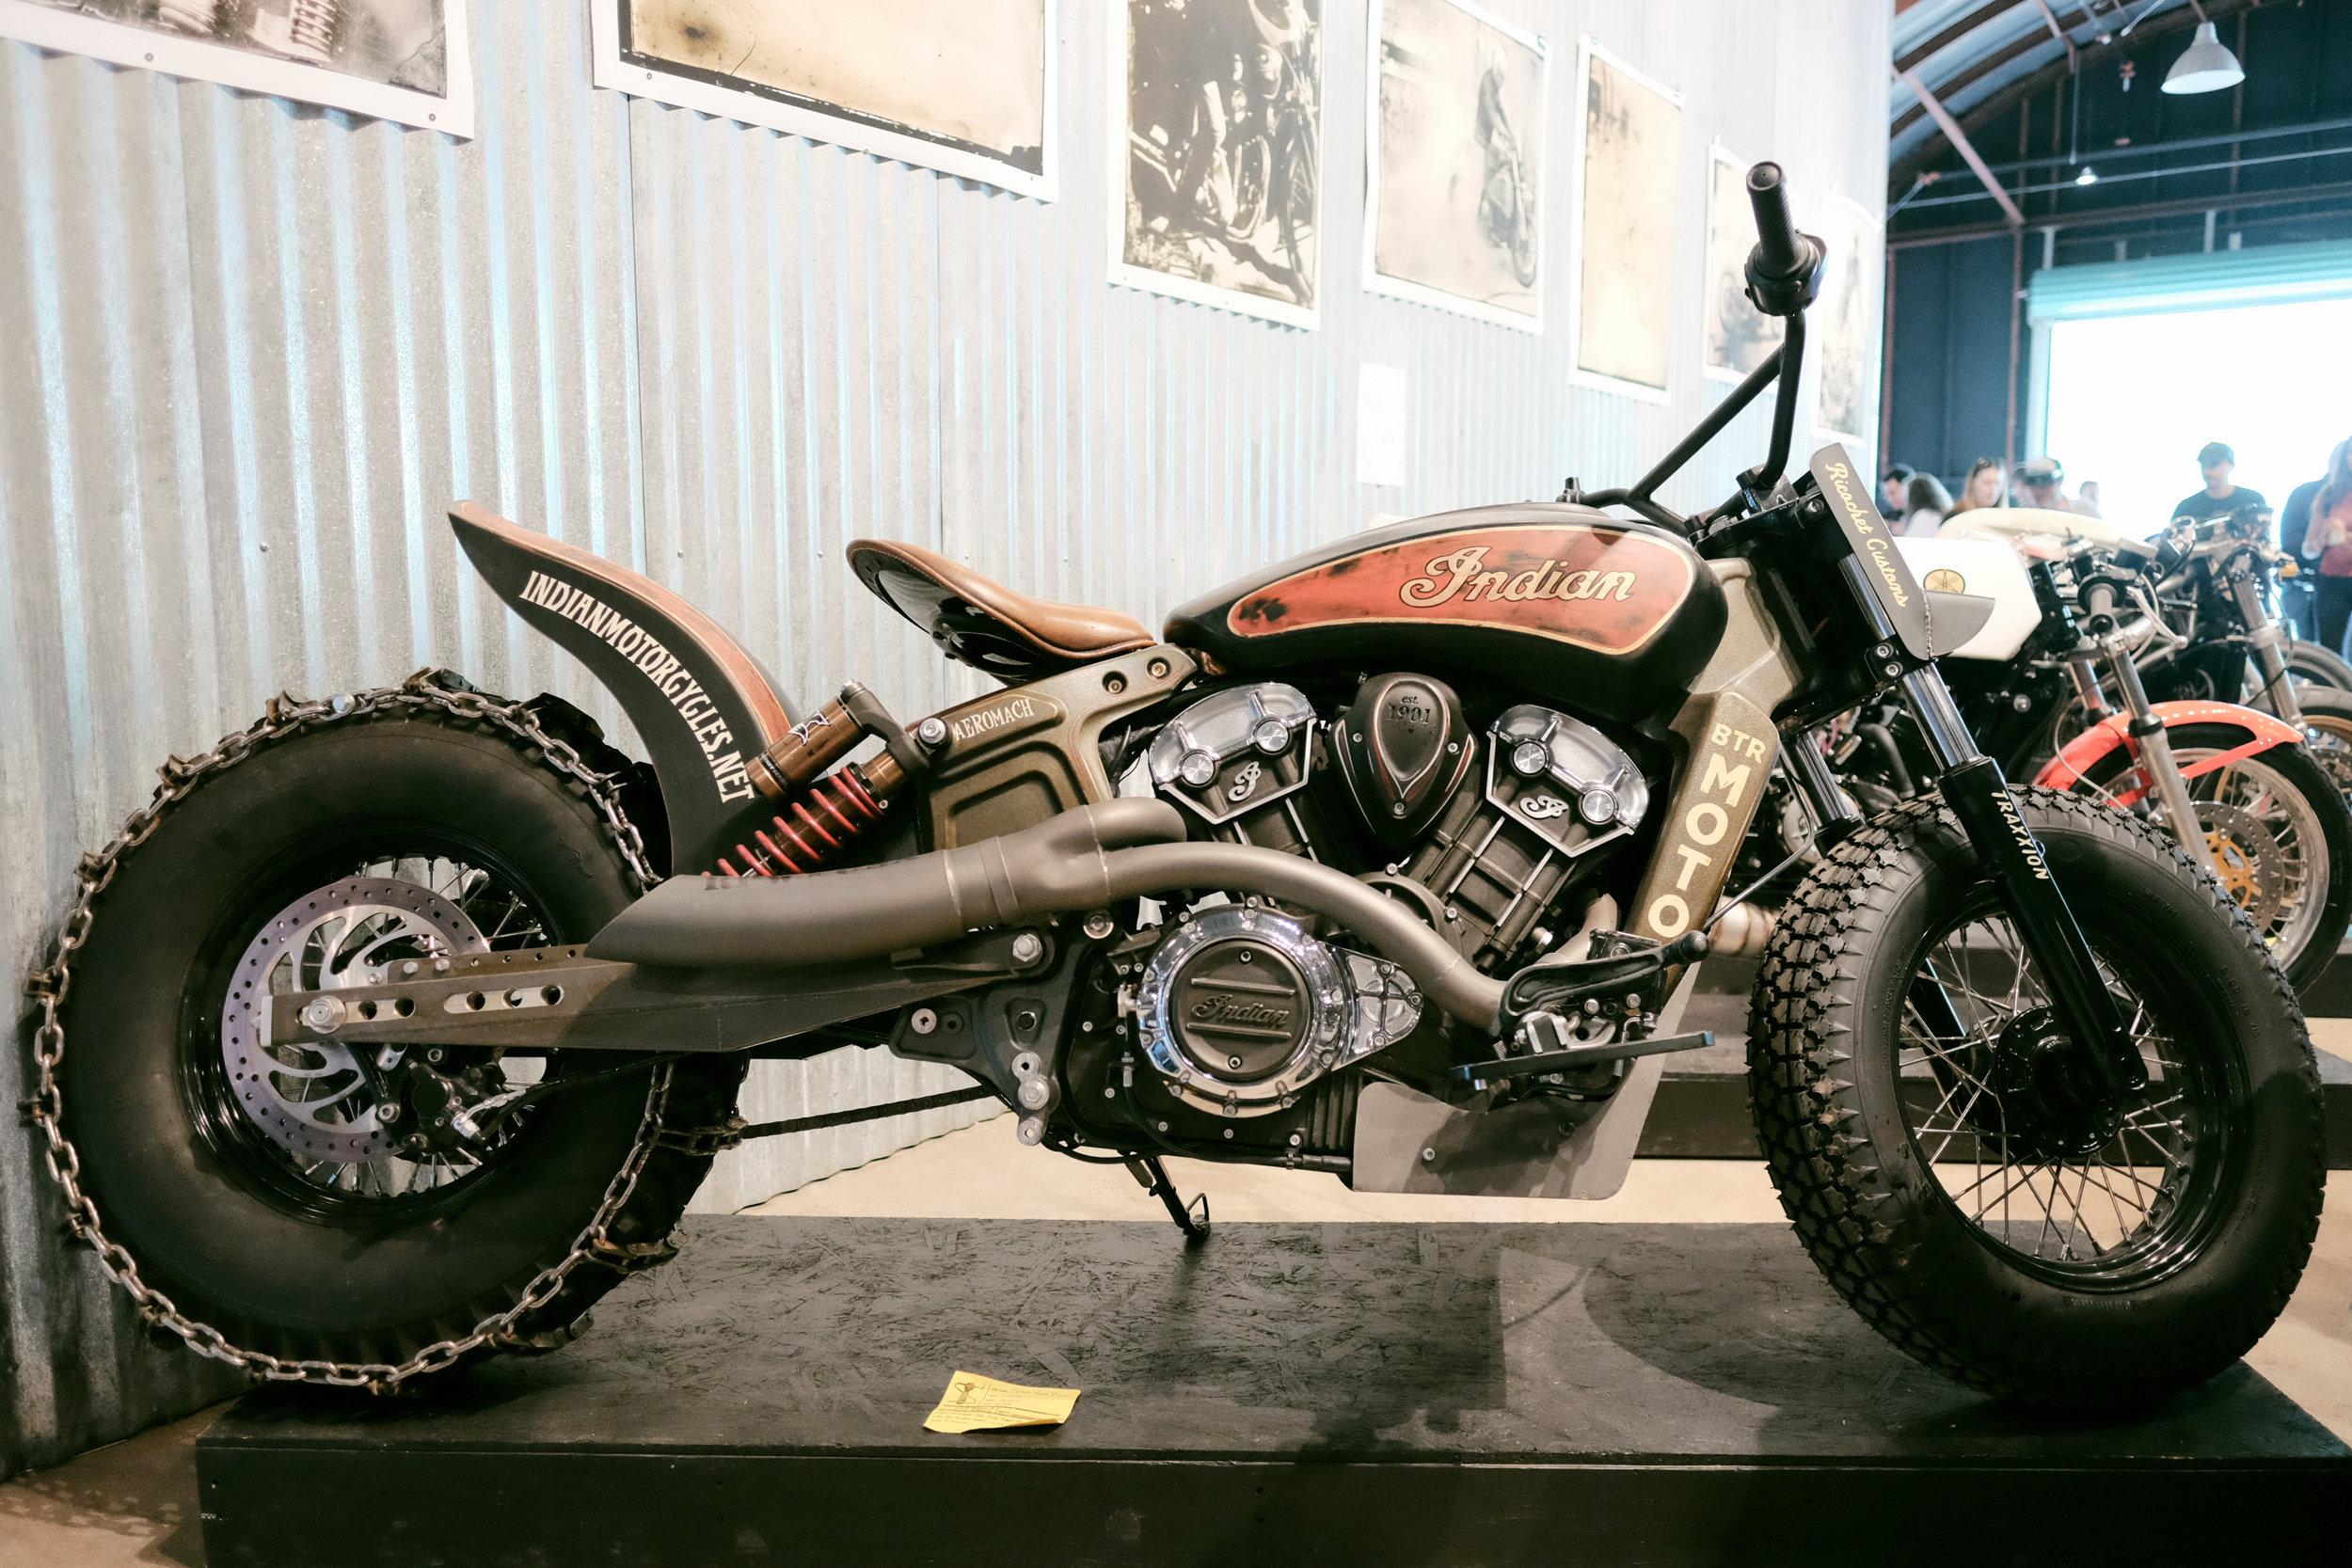 handbuilt-motorcycle-show-2016-8887.jpg